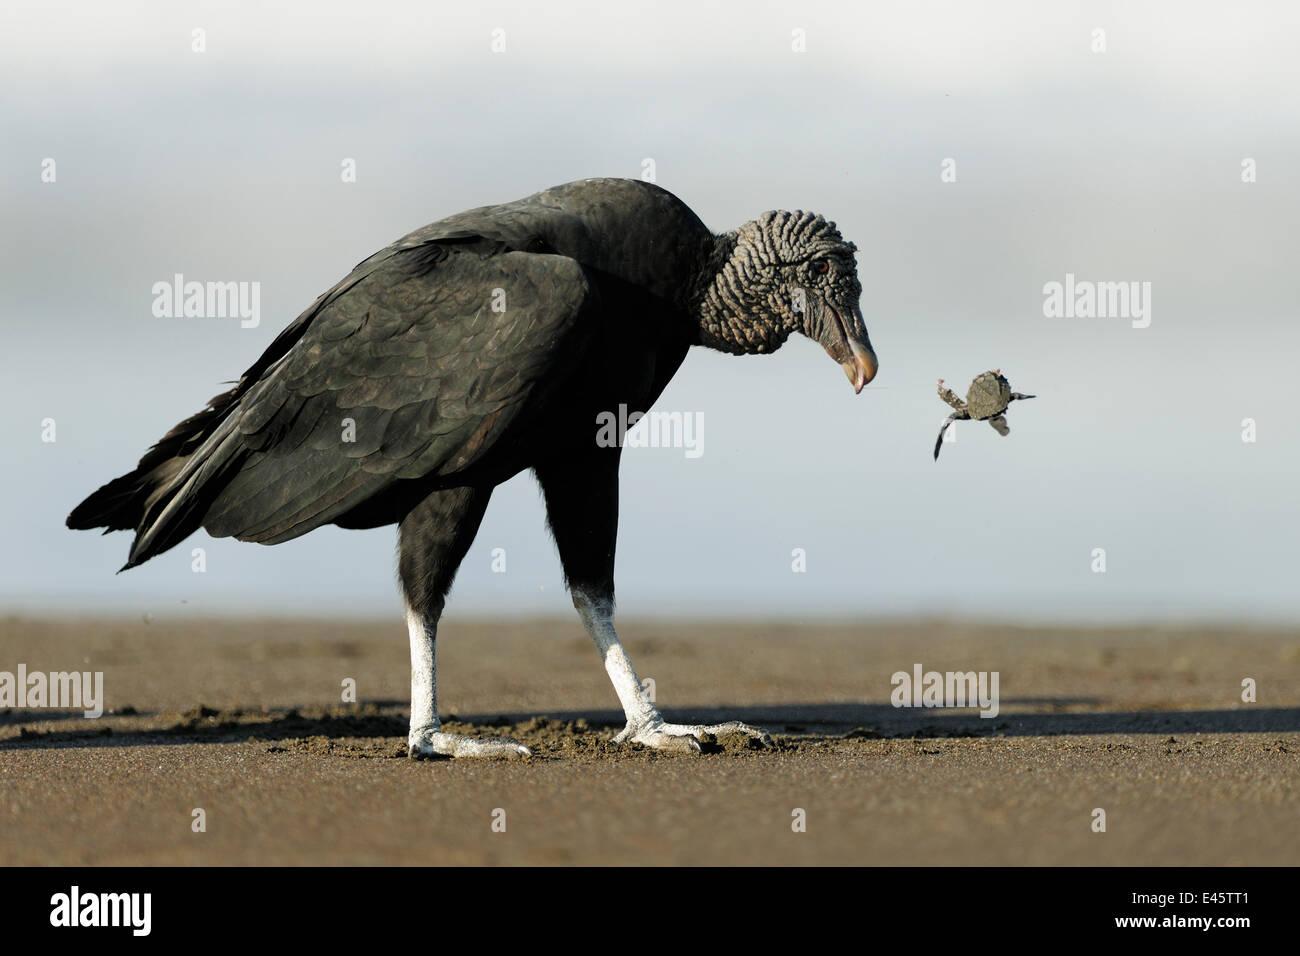 Black vulture (Coragyps atratus) feeding on Olive ridley sea turtle hatchling (Lepidochelys olivacea) Playa Ostional, - Stock Image